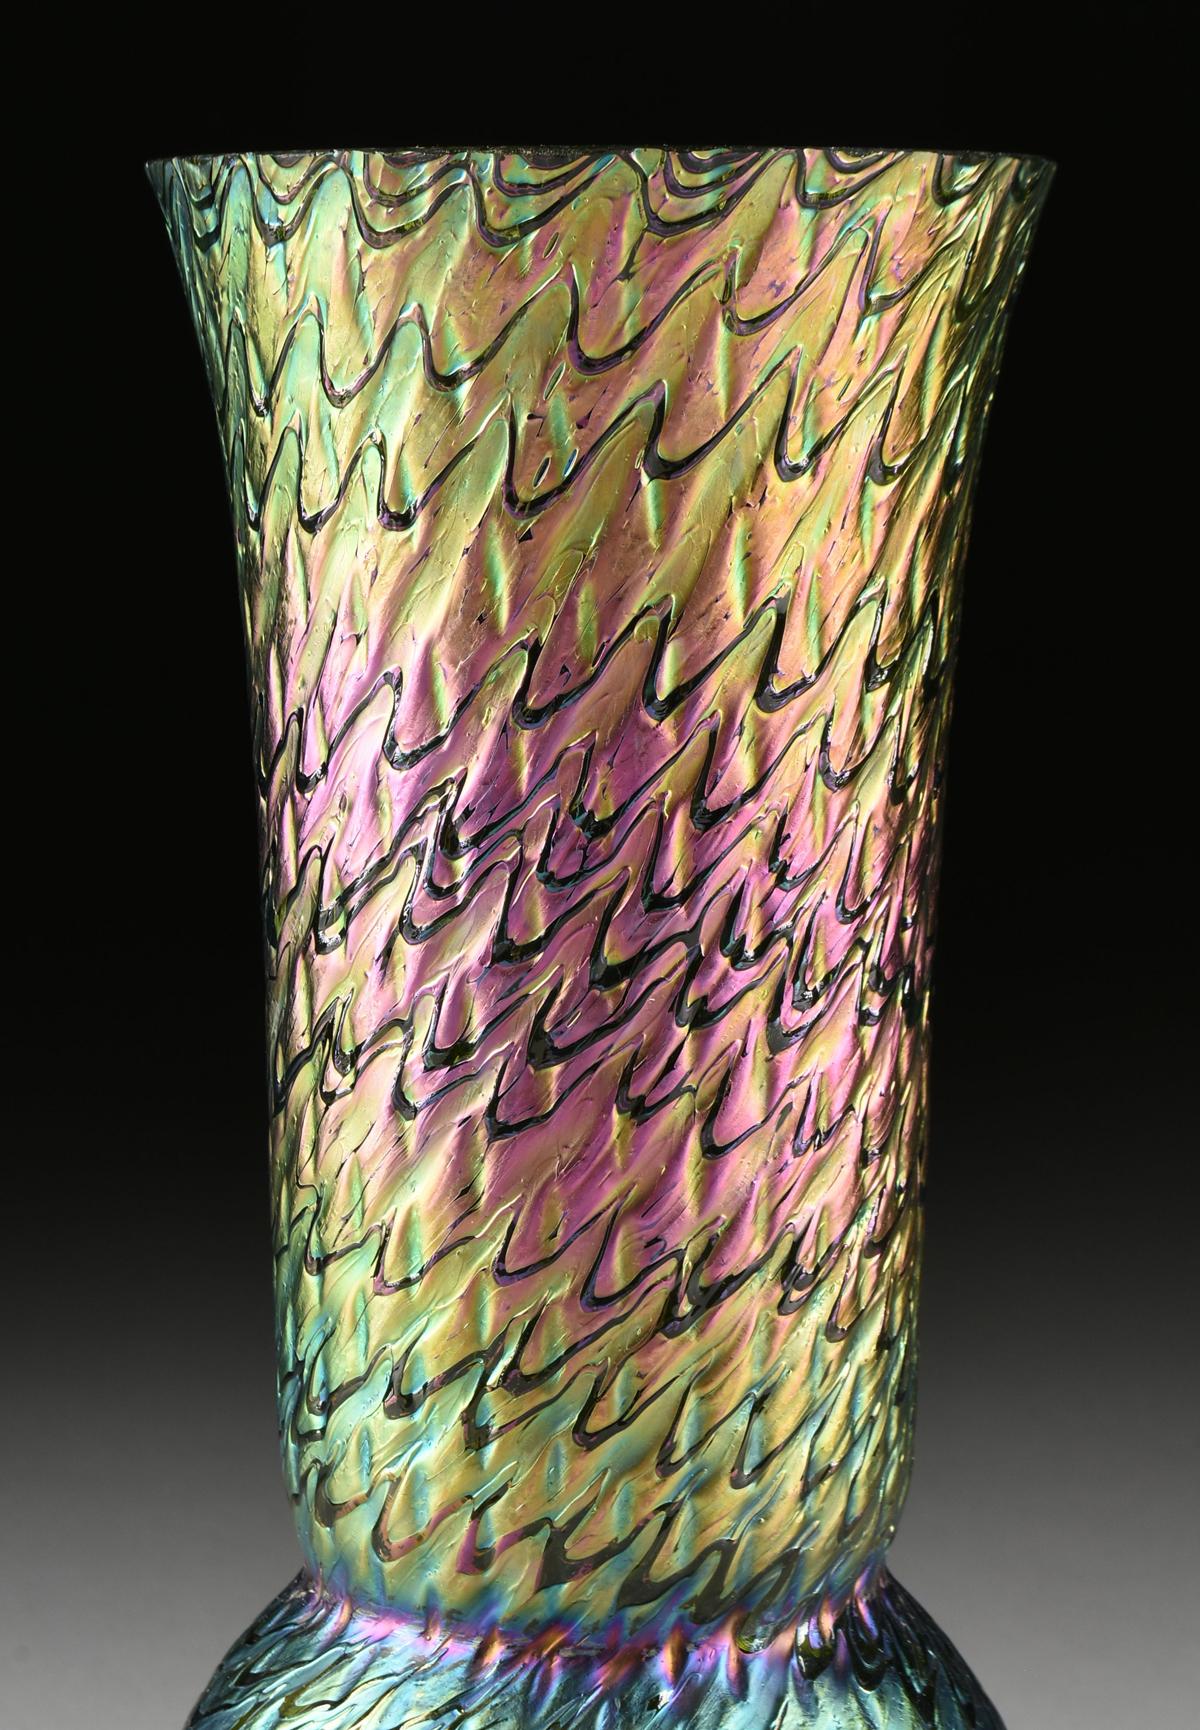 Lot 32 - TWO IRIDESCENT ART GLASS VASES, LUNDBERG STUDIOS, CALIFORNIA, CIRCA 1996, the trumpet vase with a